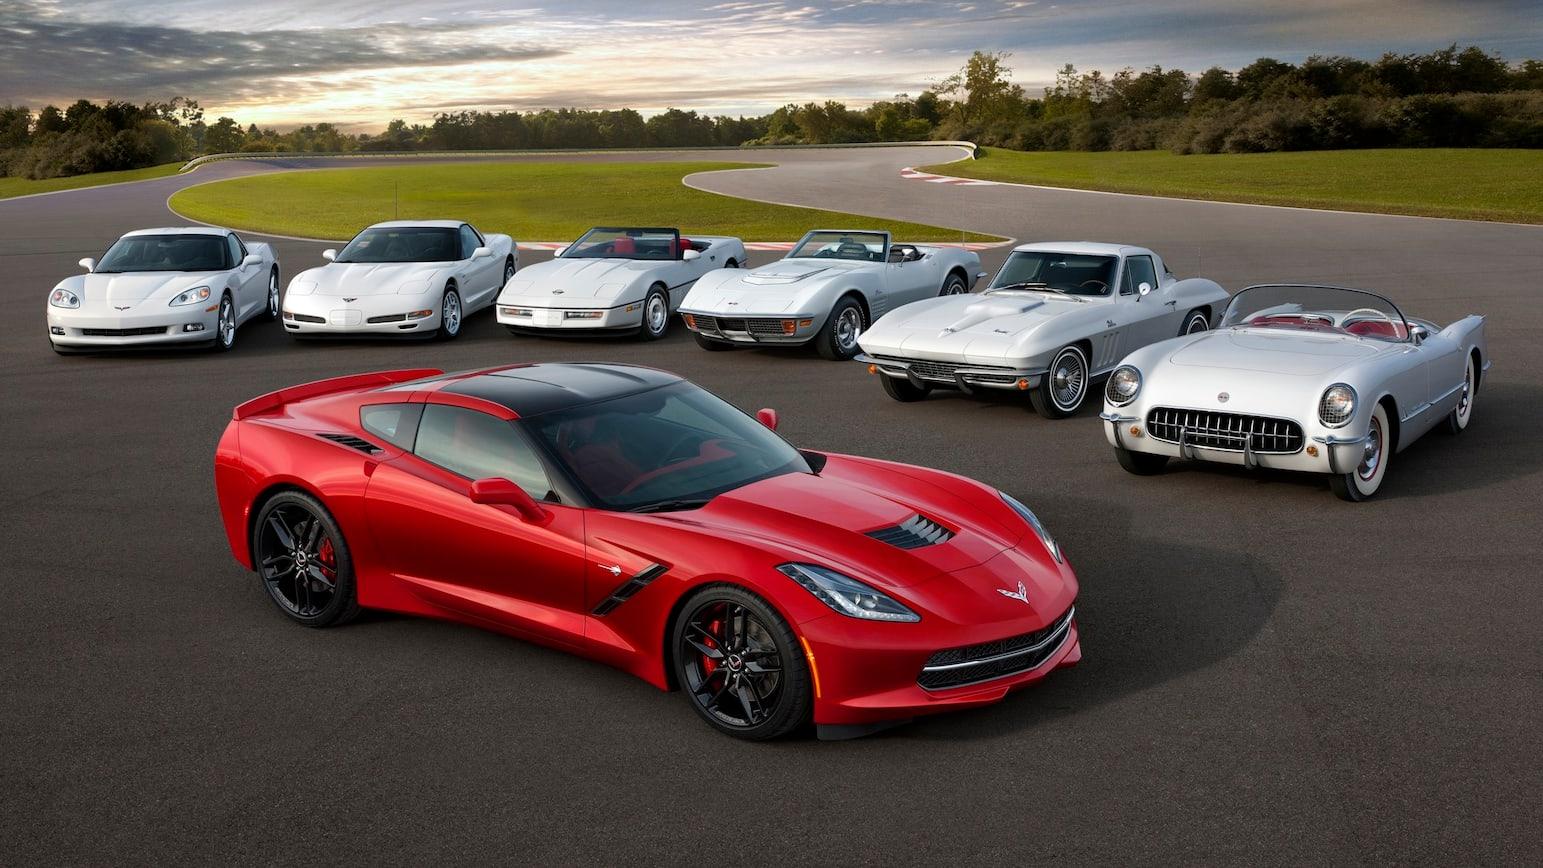 Corvette frame spotted at General Motors battery lab: Hybrid Corvette on the way?